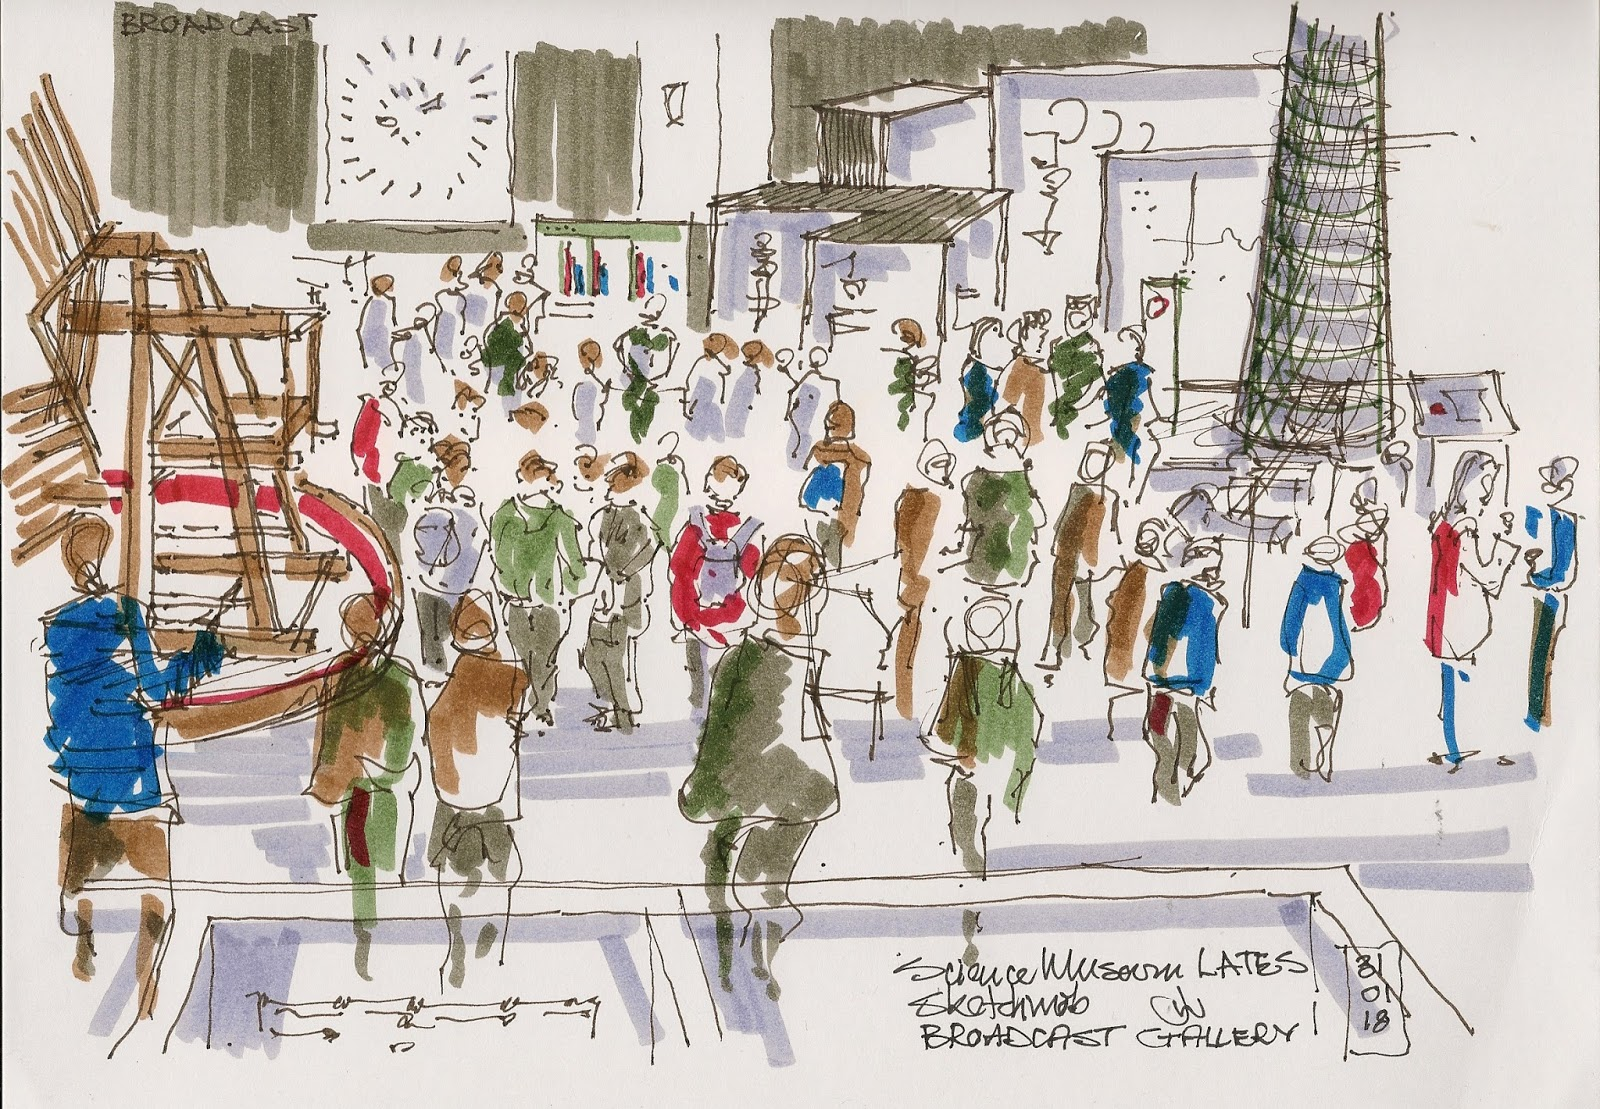 Museum Lates London Urban sketchers london science museum lates science museum lates sisterspd